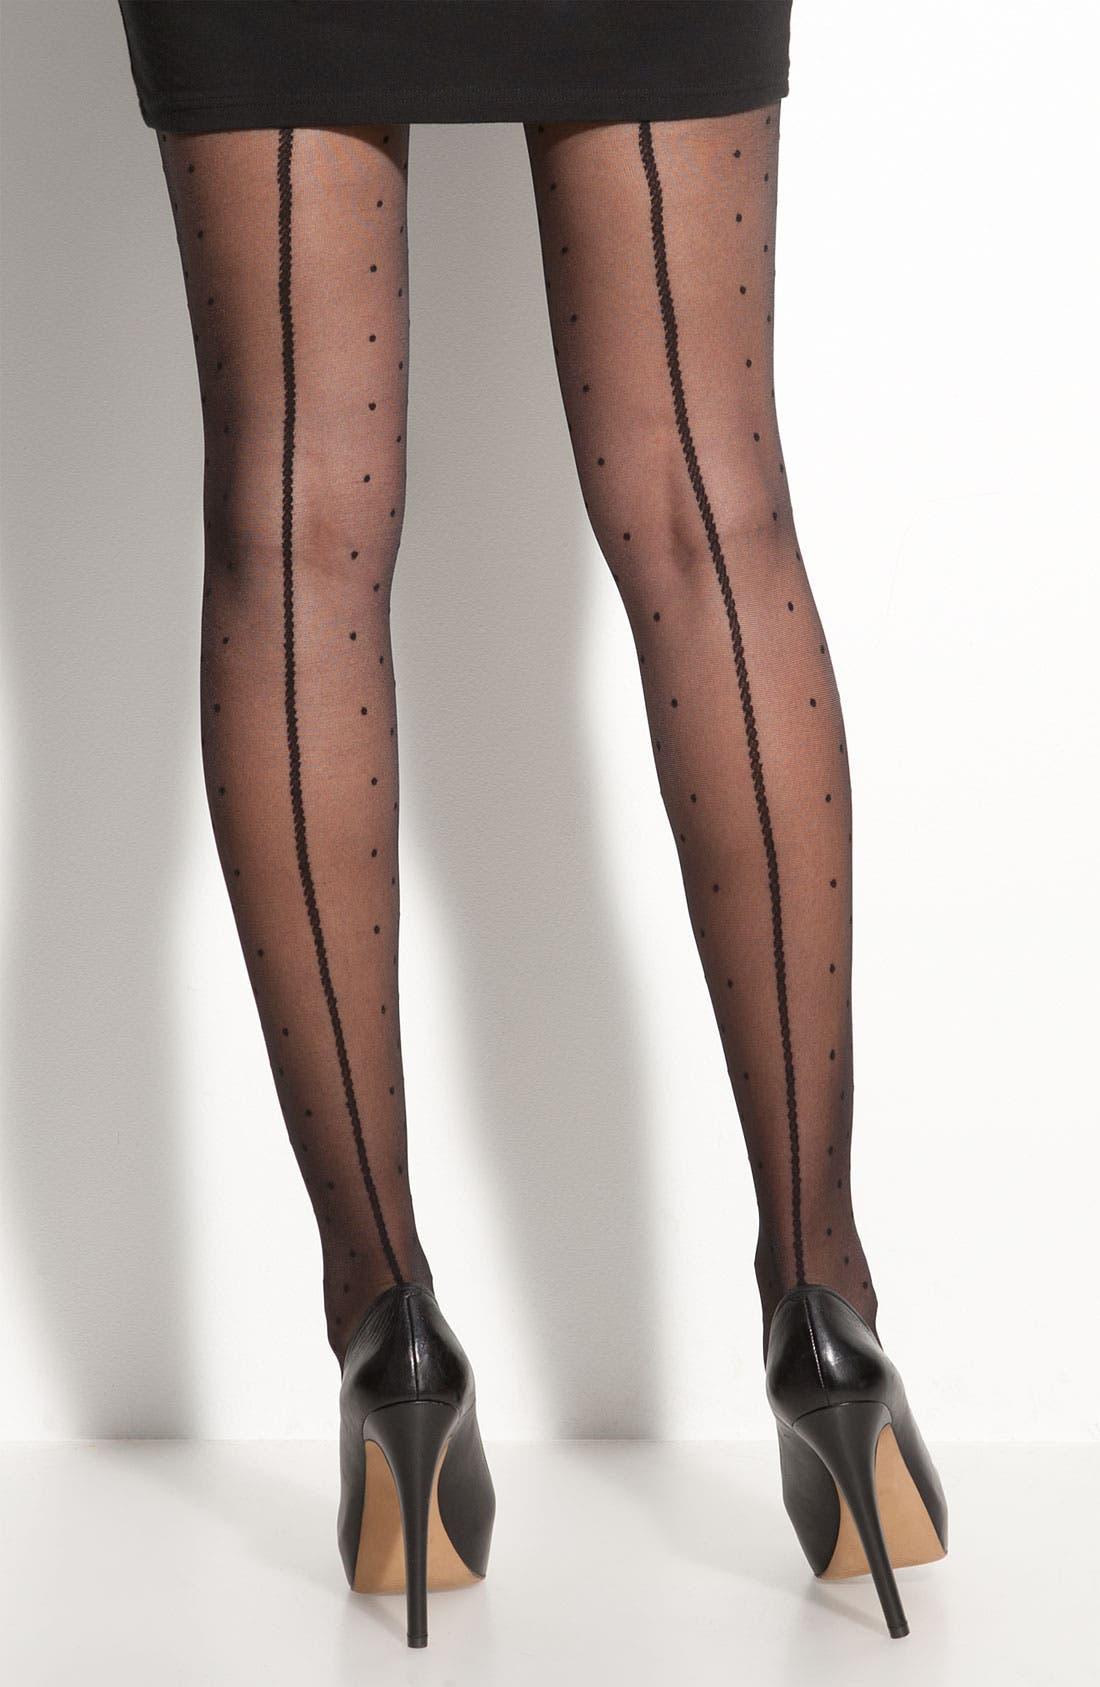 NORDSTROM 'Back Seam Dot' Stockings, Main, color, 001